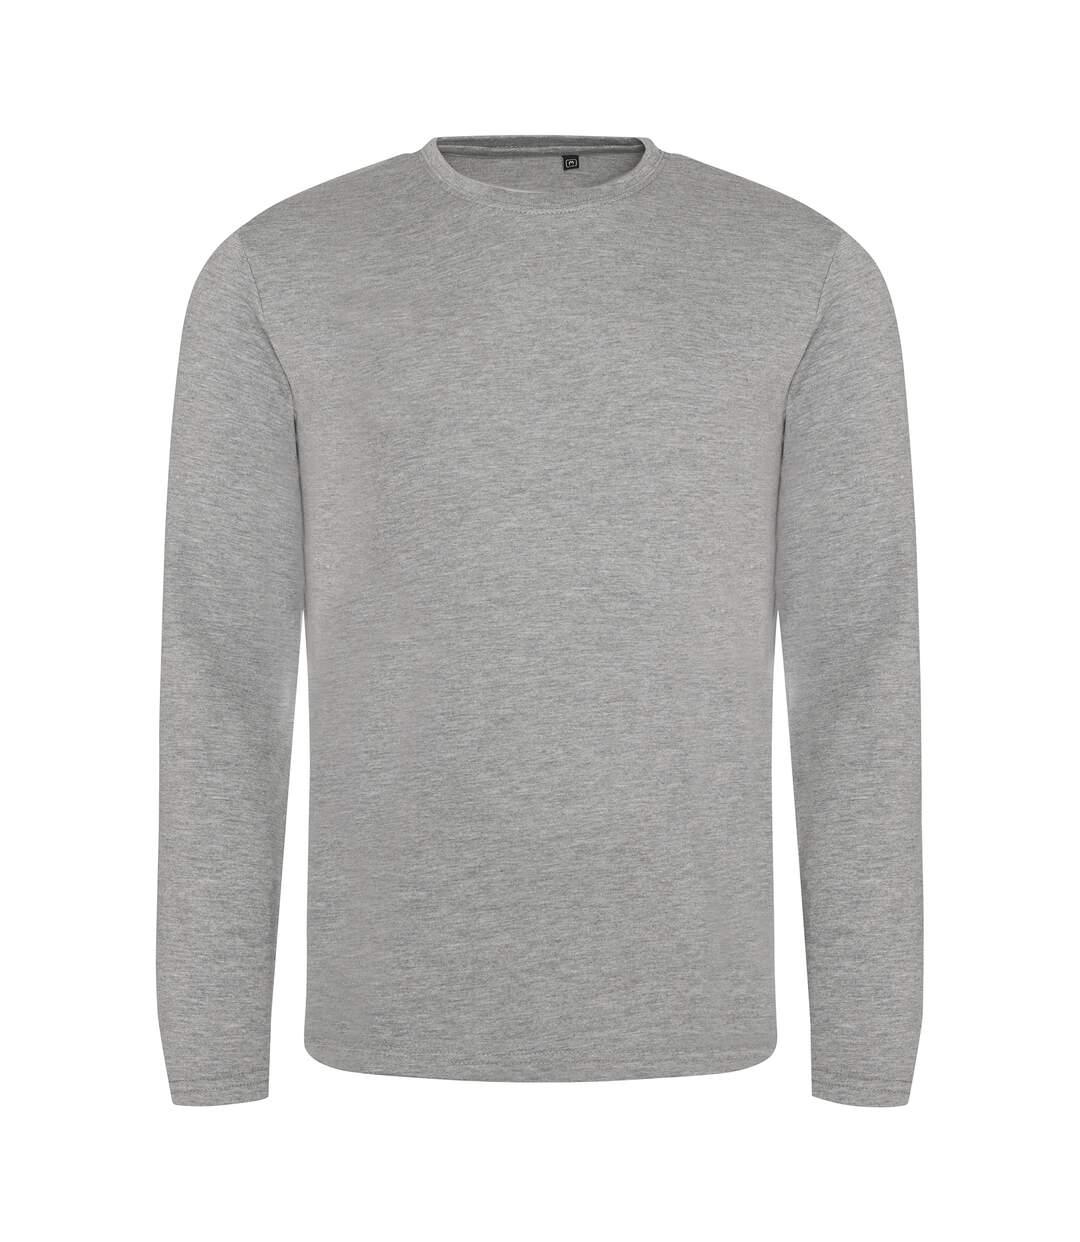 AWDis Mens Long Sleeve Tri-Blend T-Shirt (Heather Grey) - UTPC2975